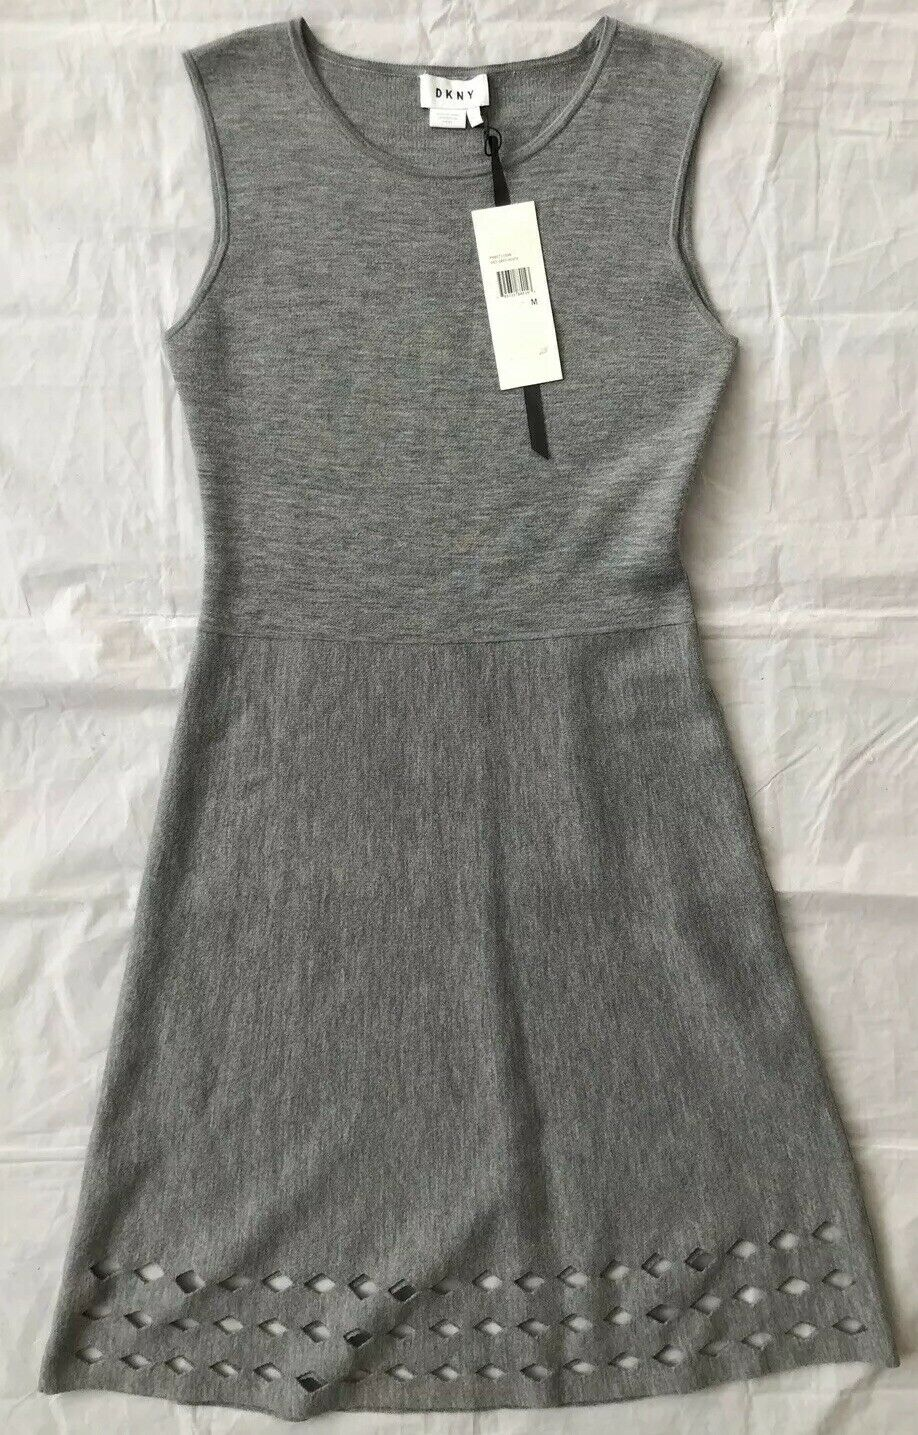 DKNY Women's Knit Fit Fit Fit and Flare Dress Grey Sz M NWT  258 5f4c4c